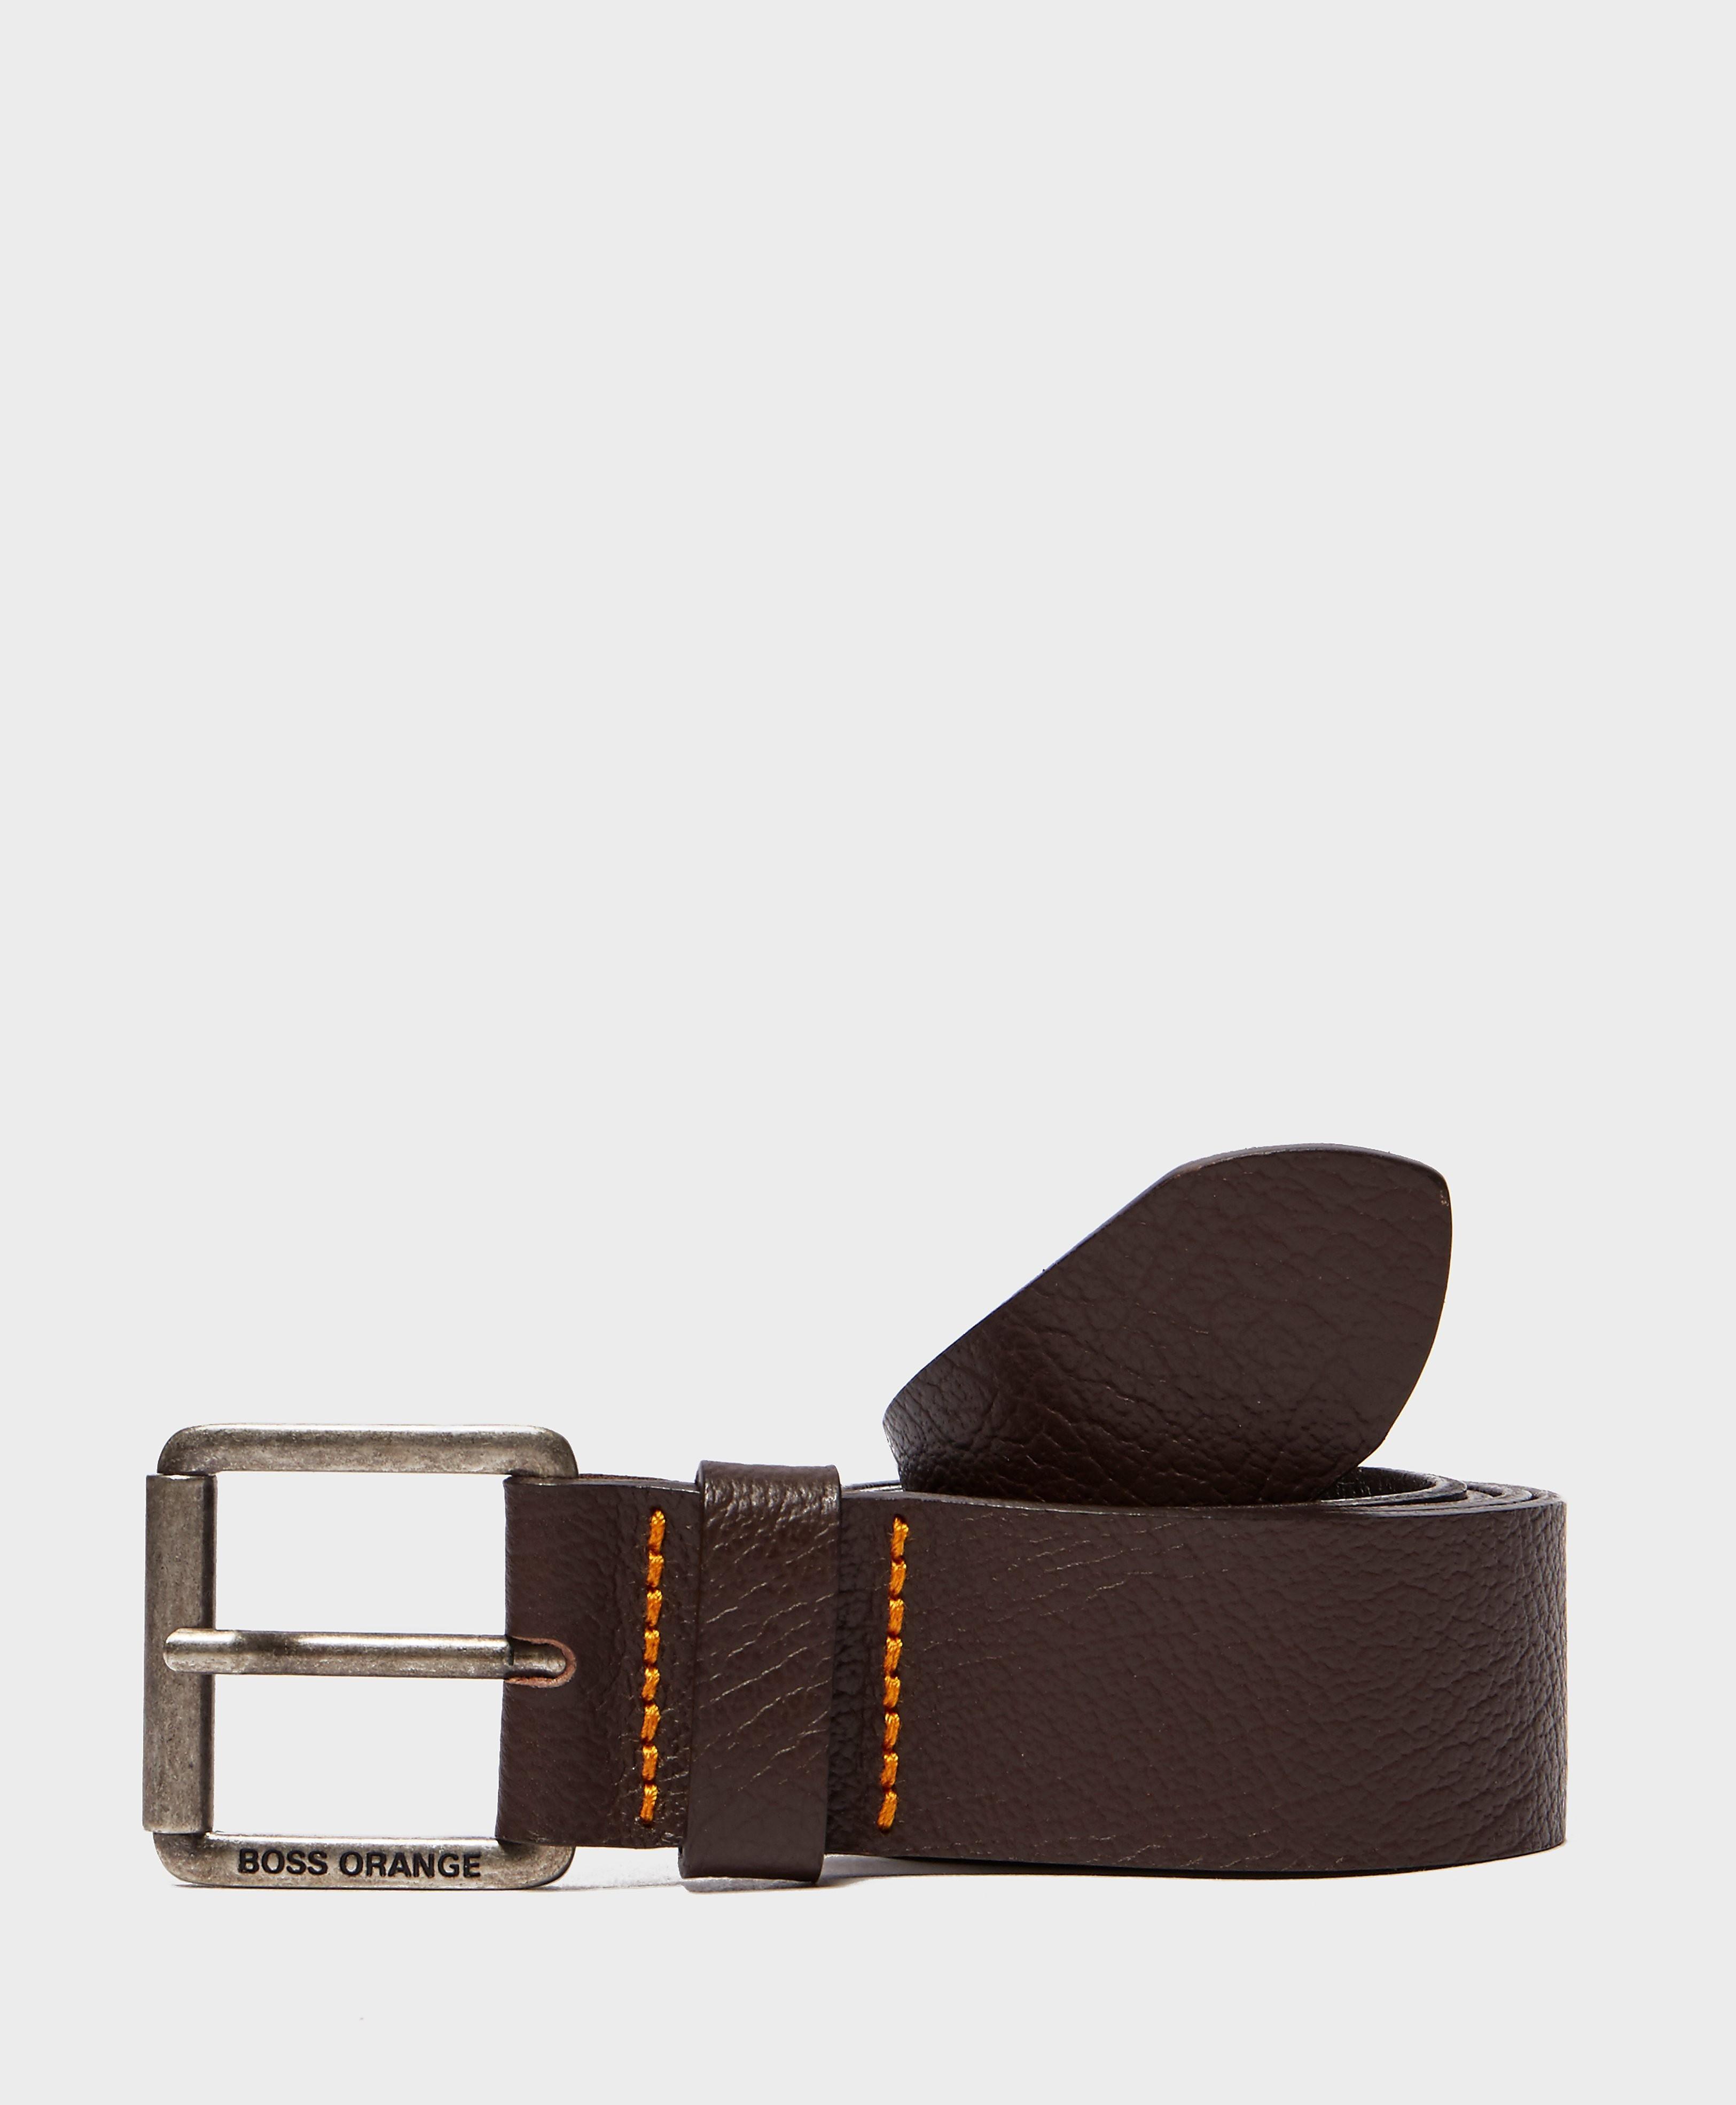 BOSS Orange Leather Belt